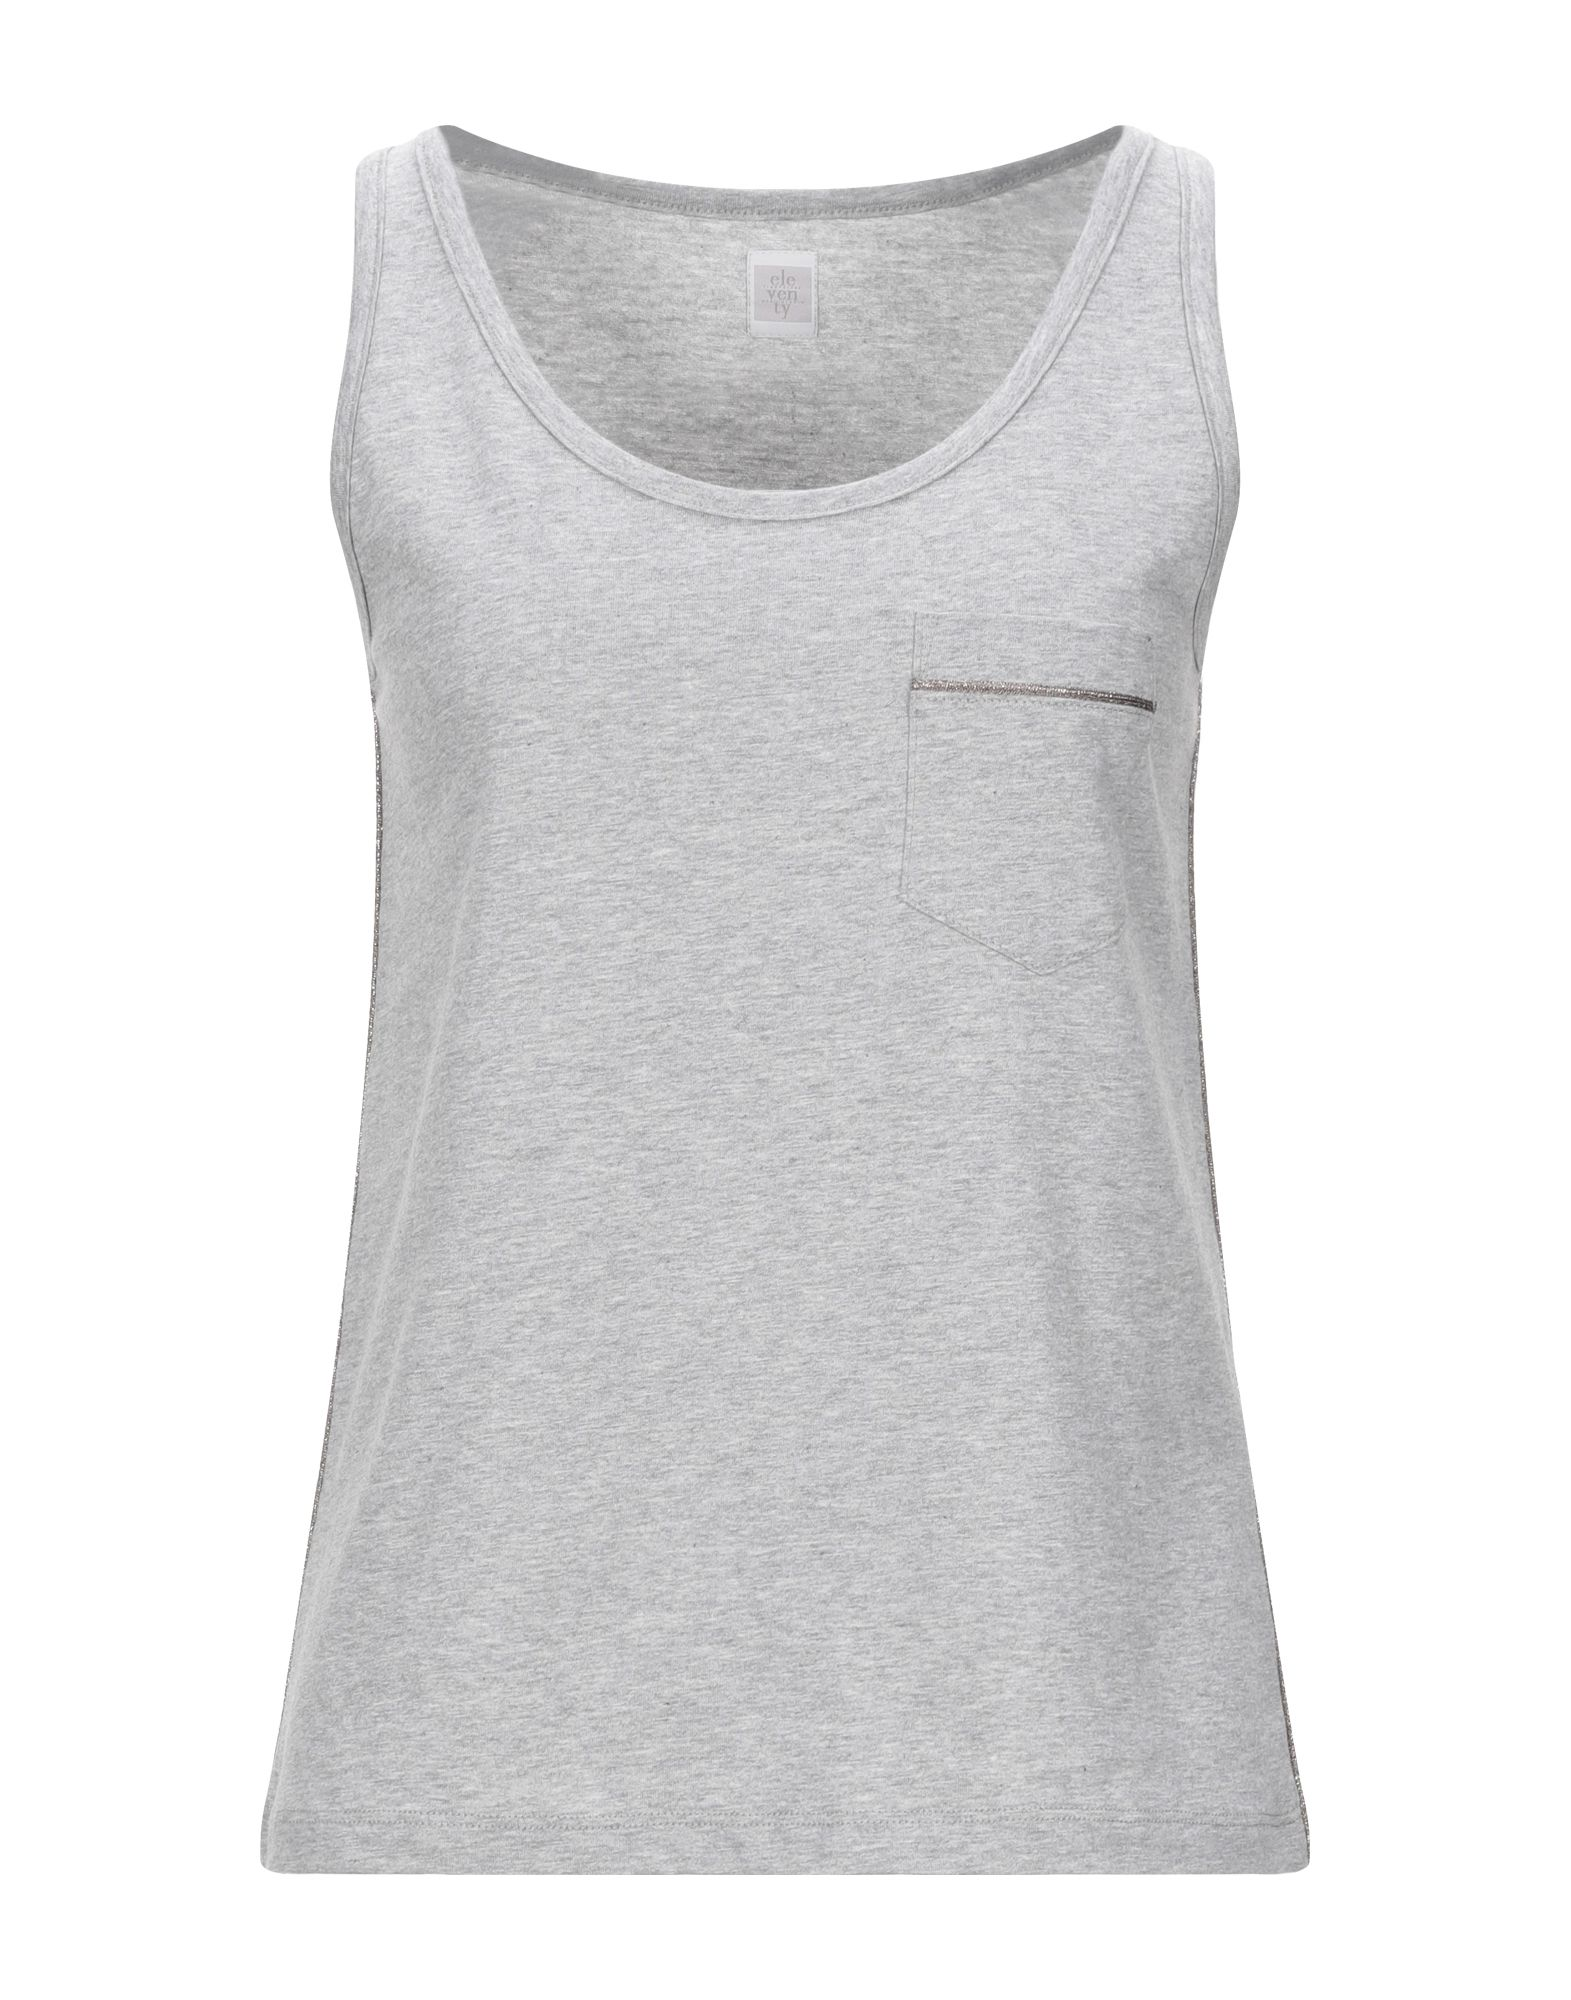 ELEVENTY Tank tops. jersey, lamé, side seam stripes, solid color, round collar, sleeveless, single pocket. 100% Cotton